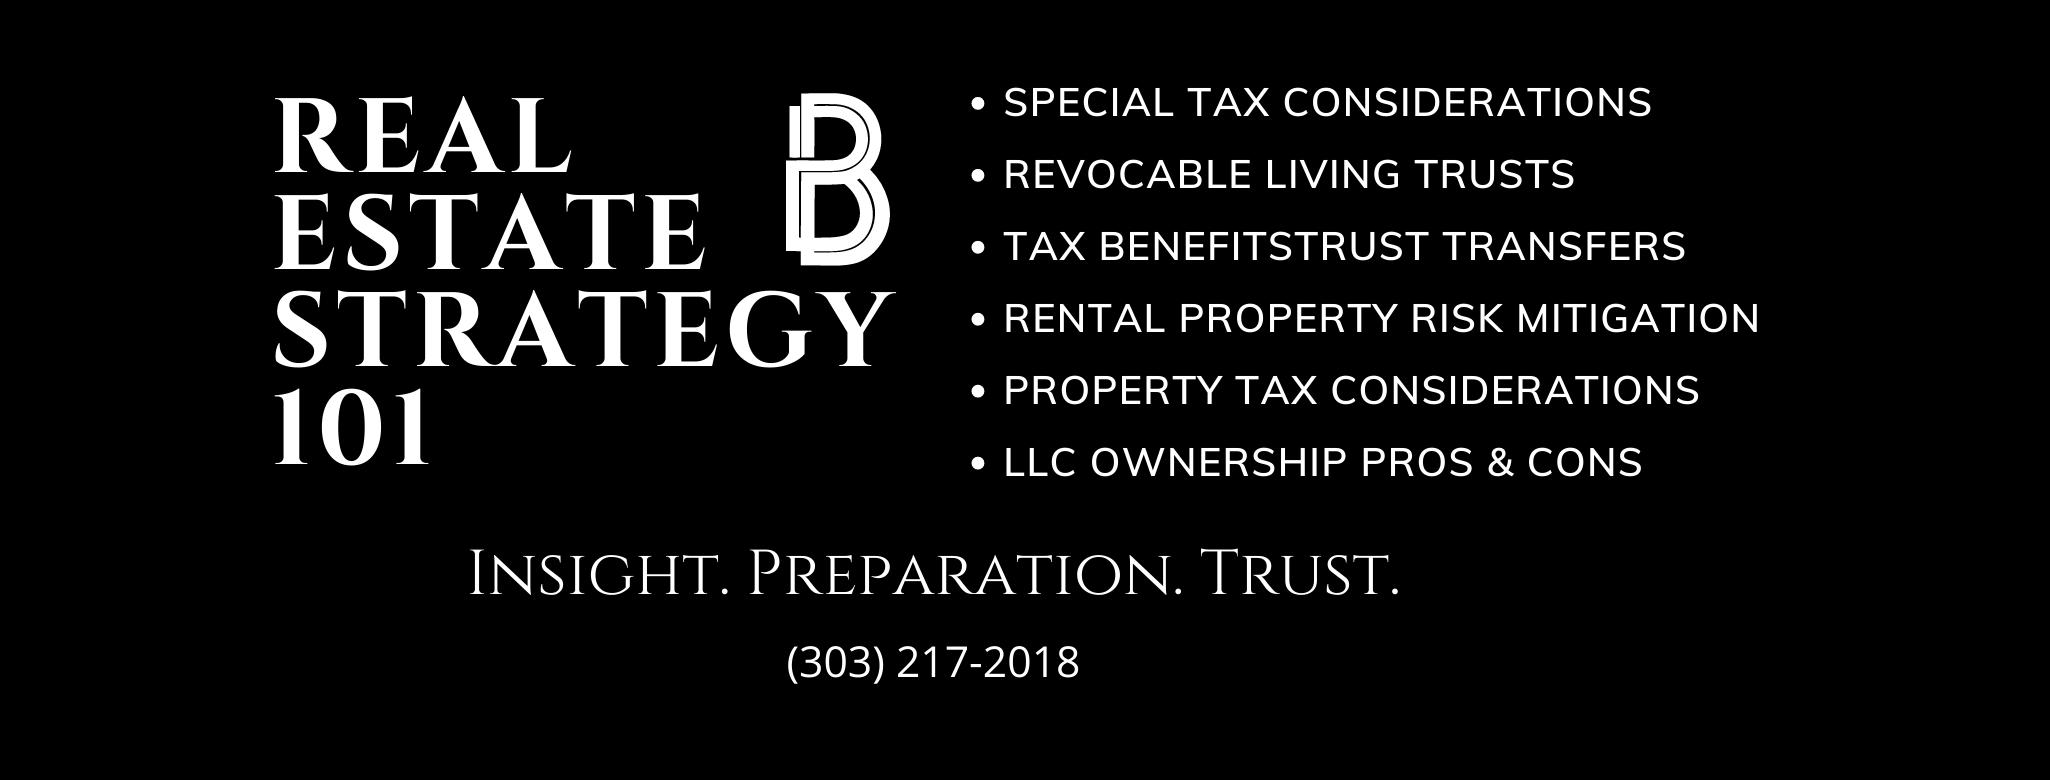 Colorado Real Estate Tax Strategy